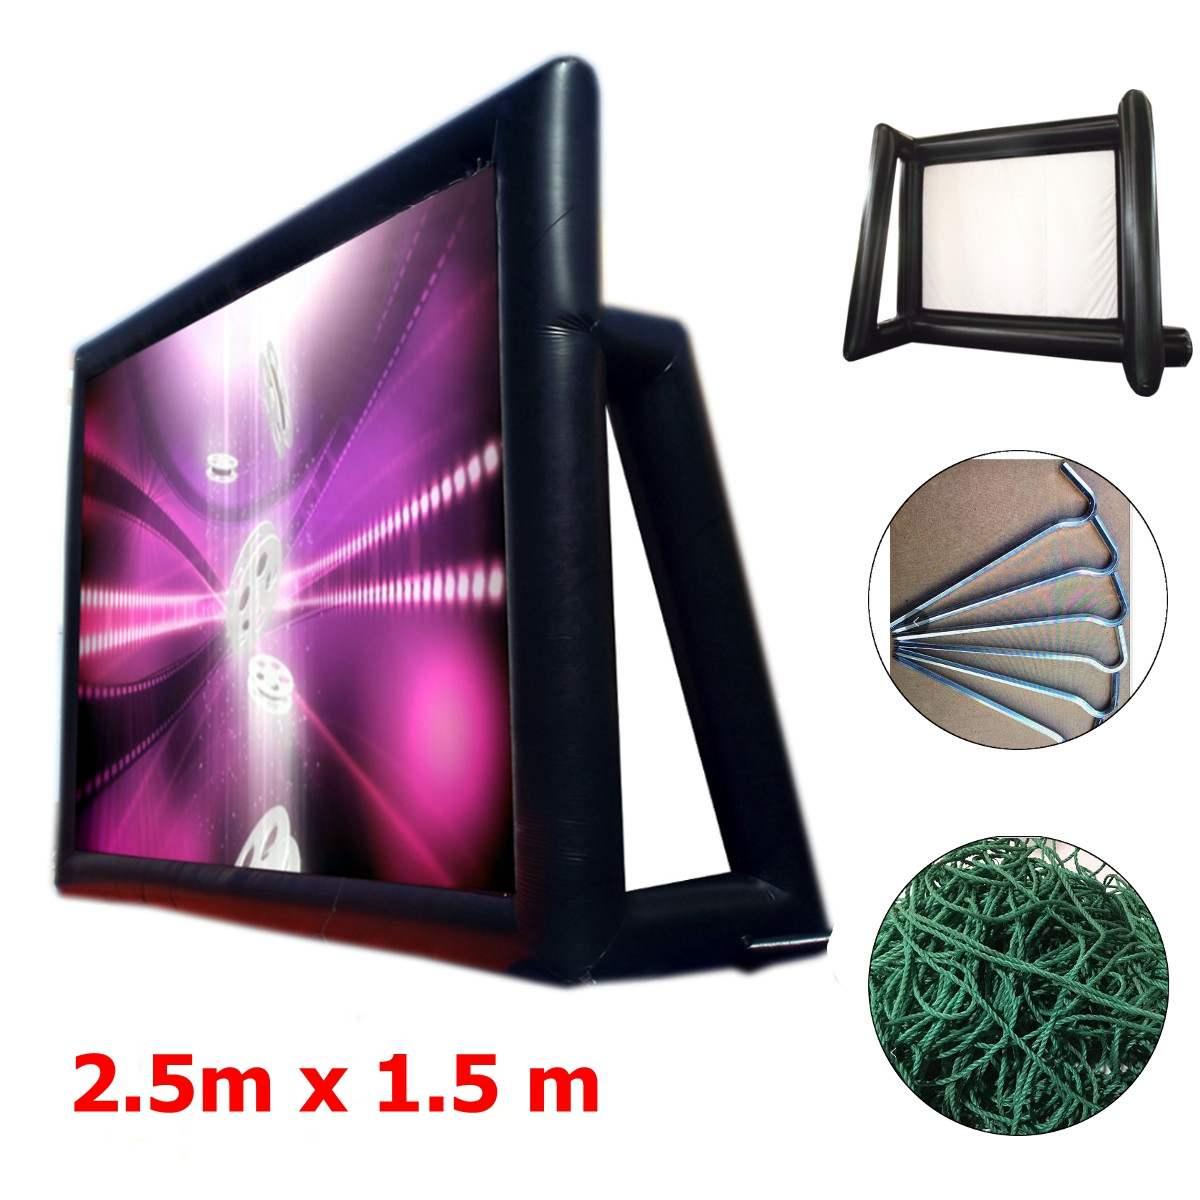 Надувной экран для видеосъемки, 1,33 м х 0,75 м, 169